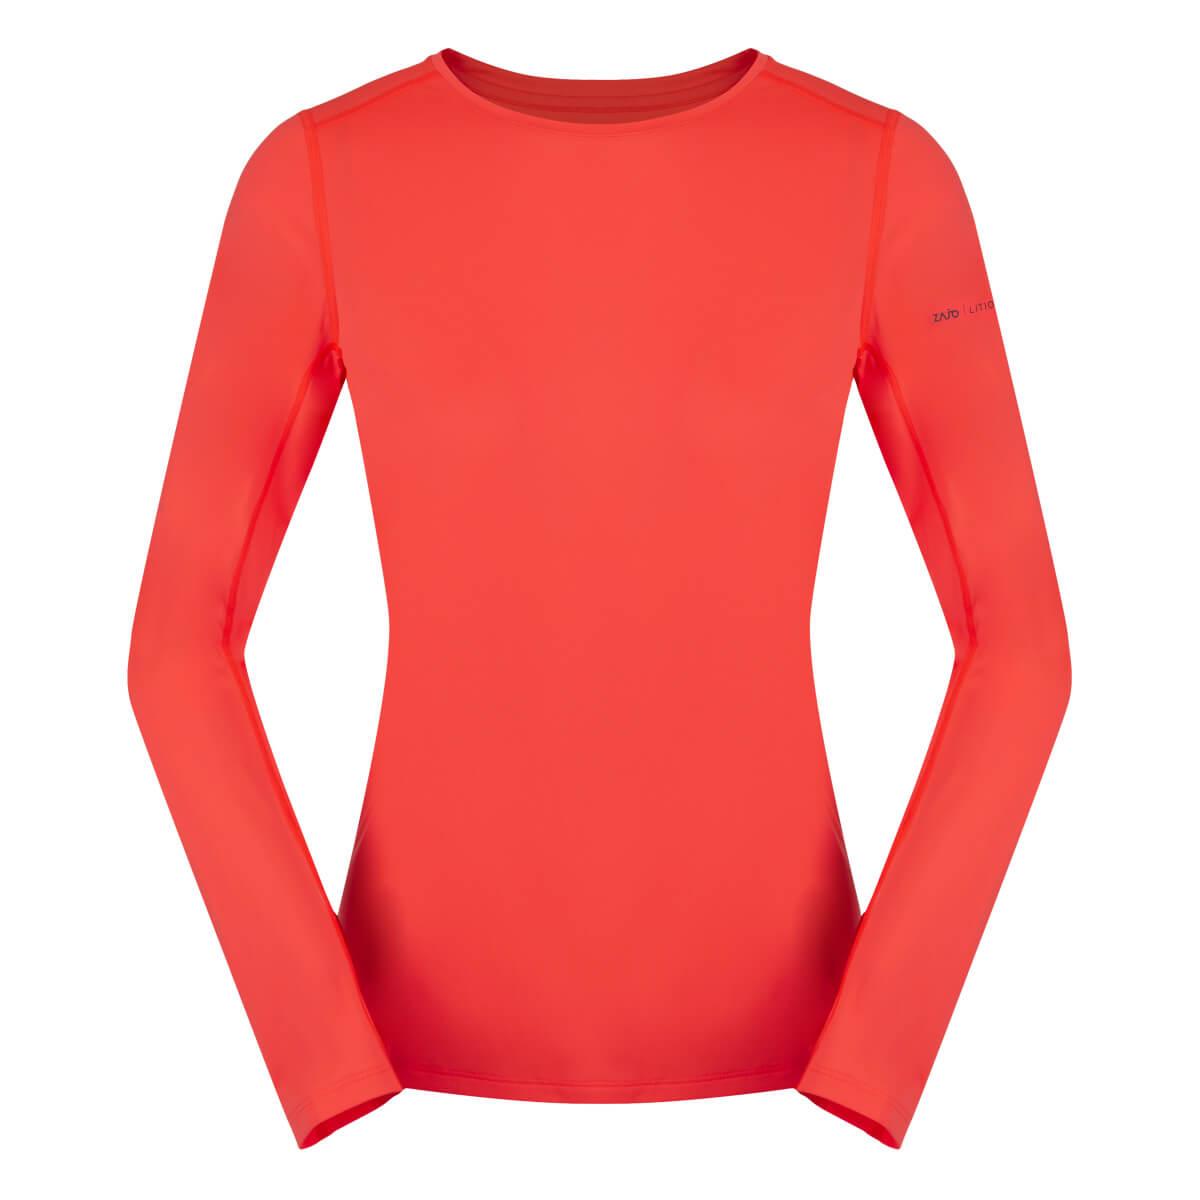 ZAJO Litio T-shirt LS Fluo Coral dámske tričko - veľkosť XS